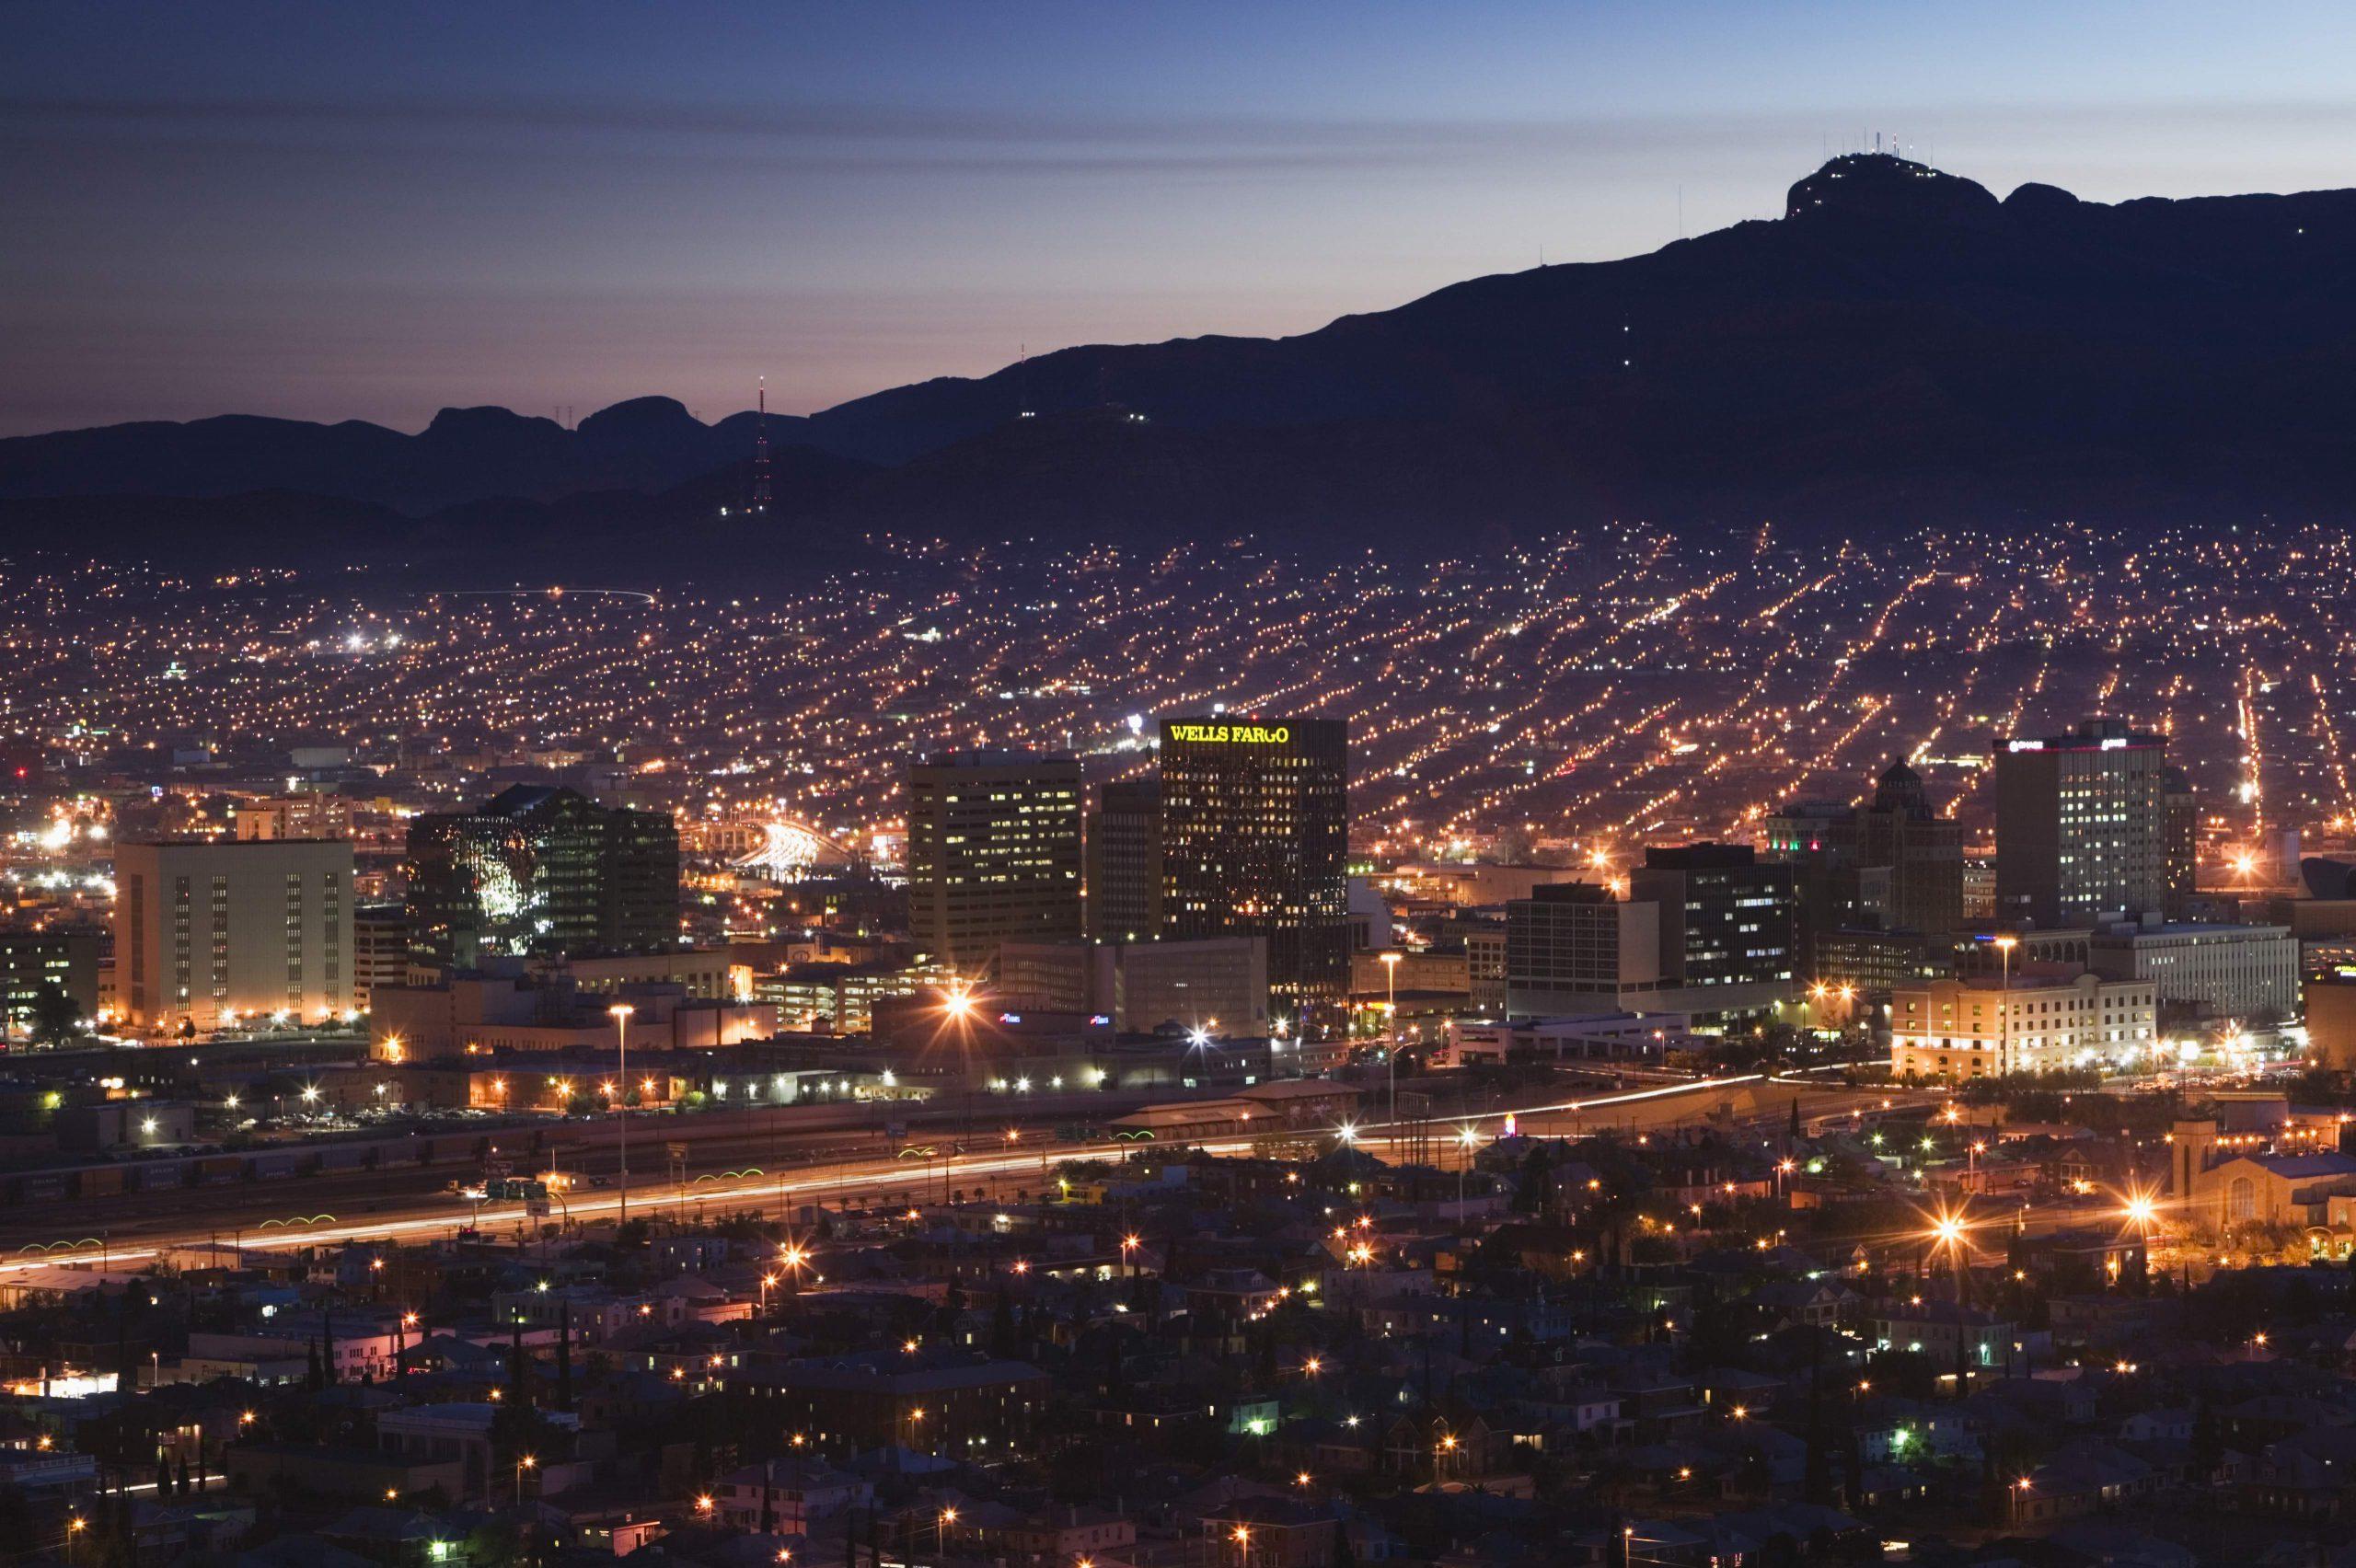 EL PASO'S MULTIMODAL SOLUTIONS FOR TOMORROW